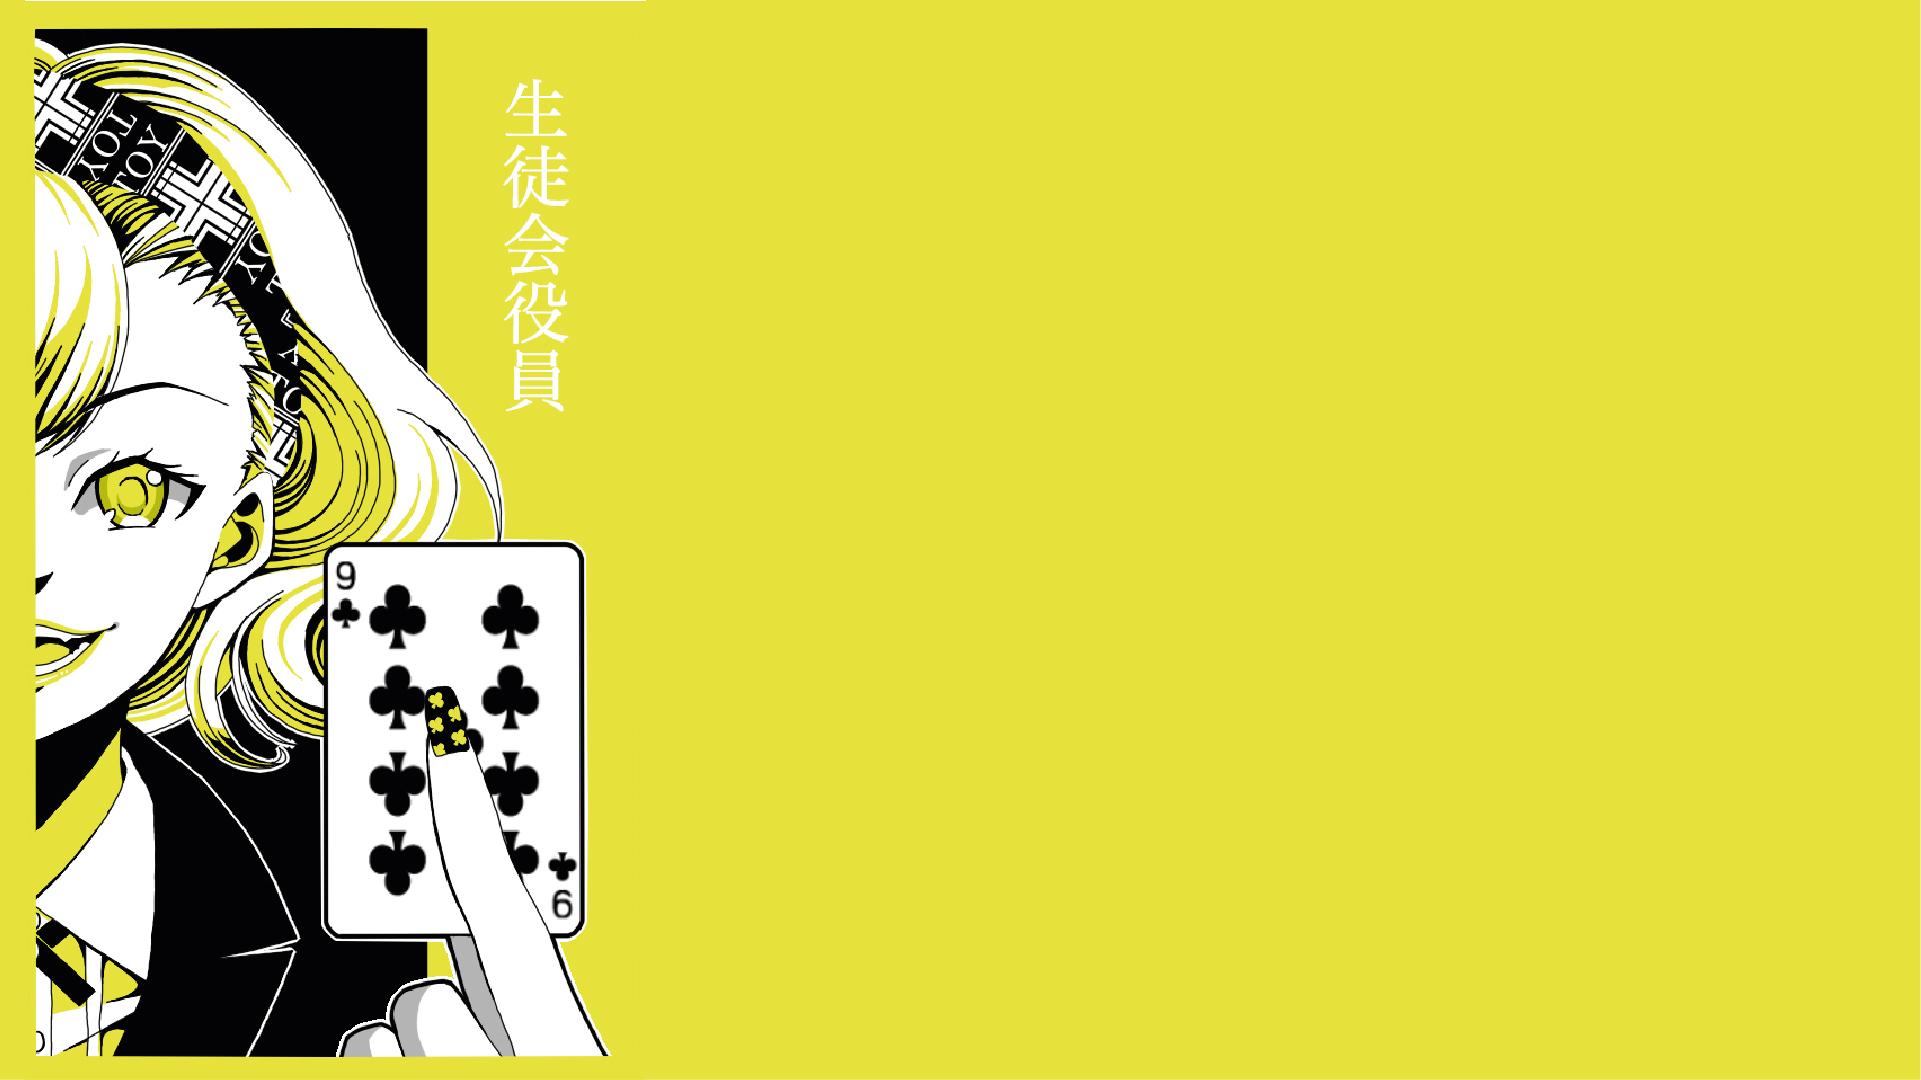 Anime 1921x1080 Kakegurui anime anime girls playing cards yellow background simple background yellow eyes